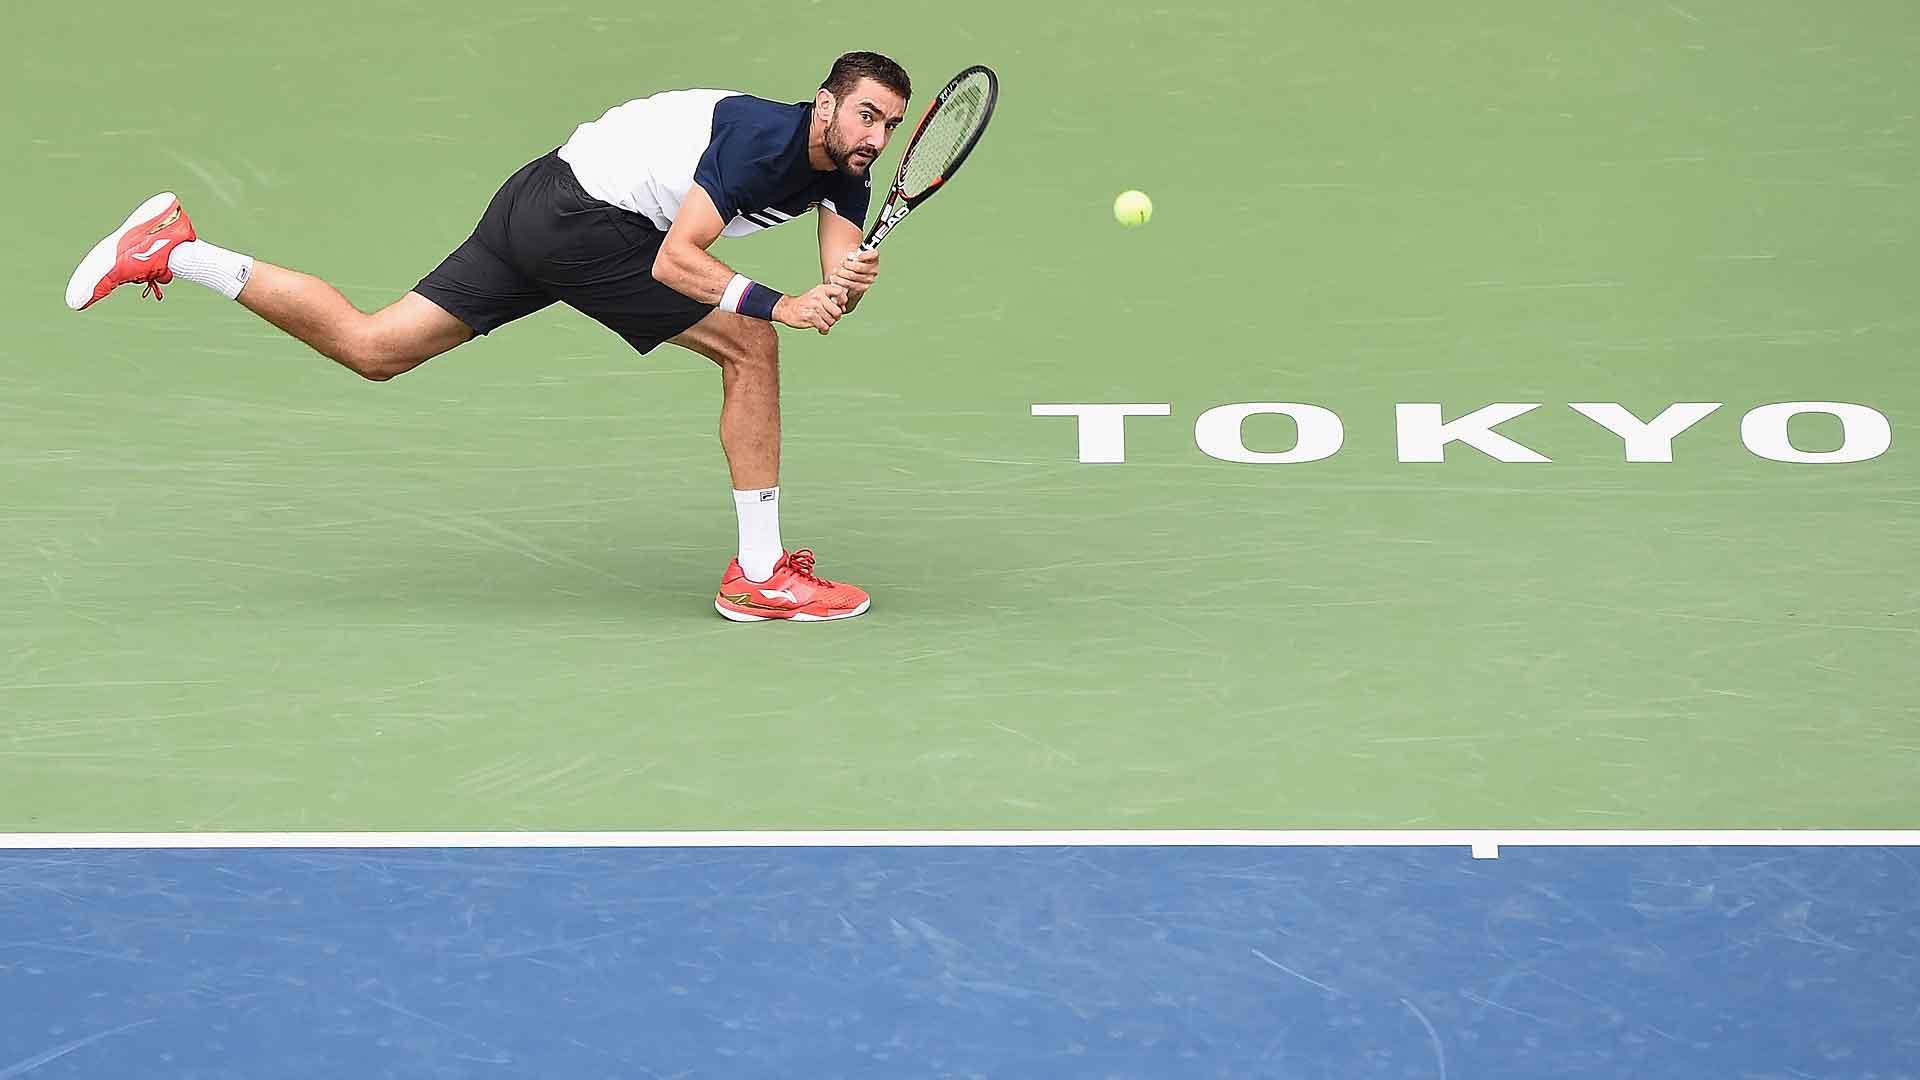 marin cilic overview atp world tour tennis